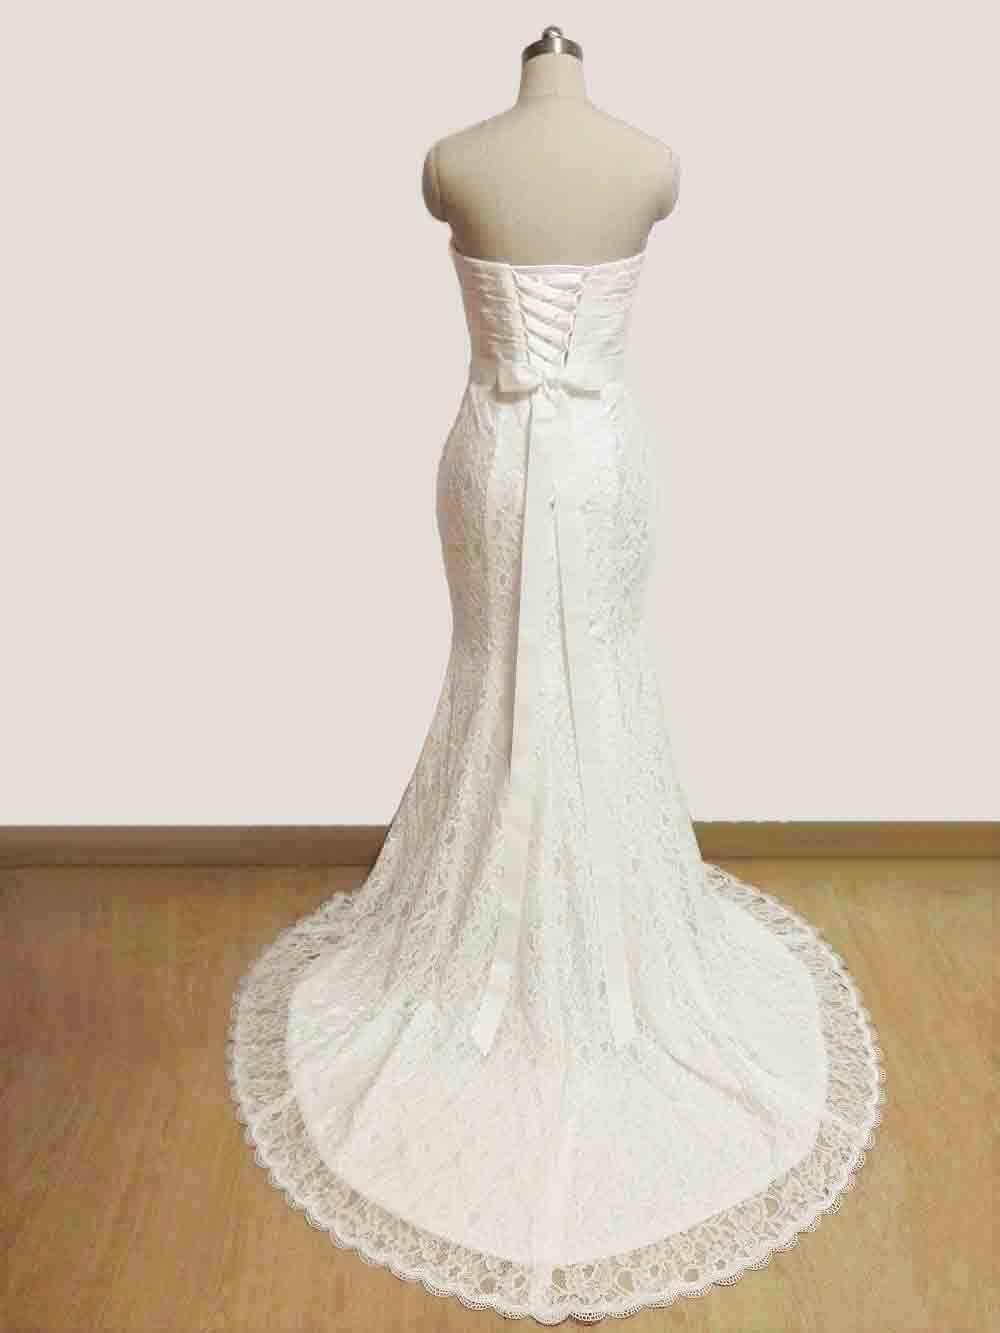 JIERUIZE vestidos de novia White Lace Mermaid Wedding Dresses 2017 Sash Sweetheart Lace Up Back Wedding Gowns abiti da sposa 2